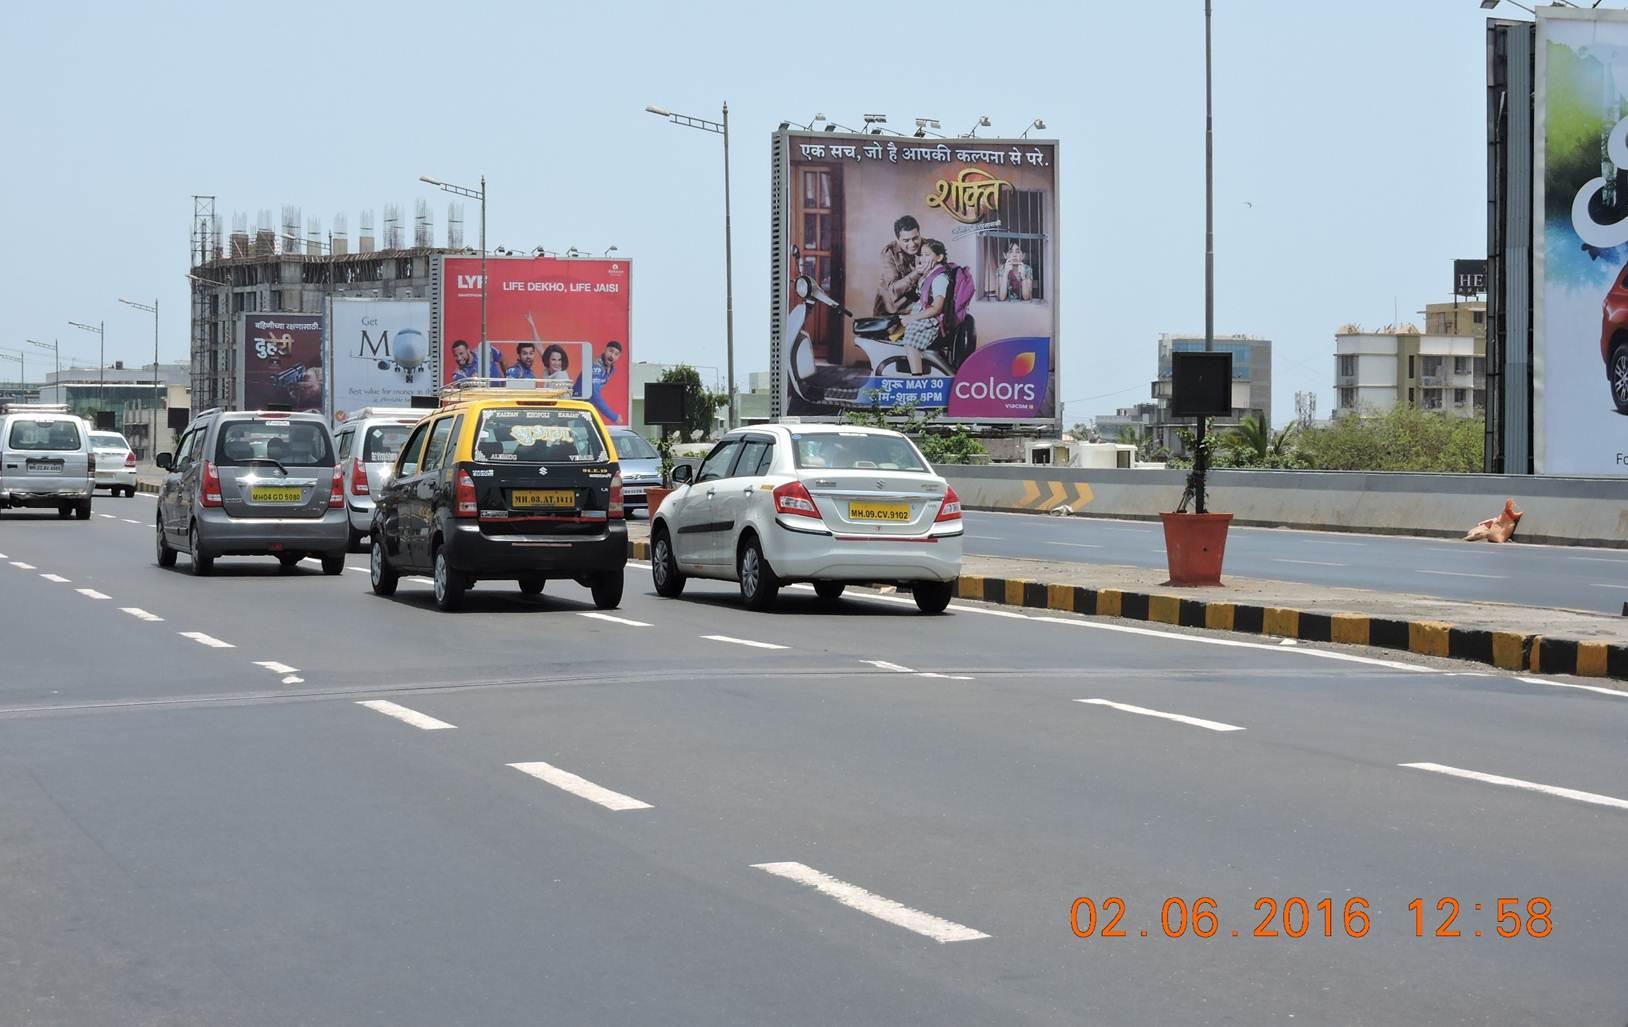 WEH, Andheri Jog Flyover, Mumbai